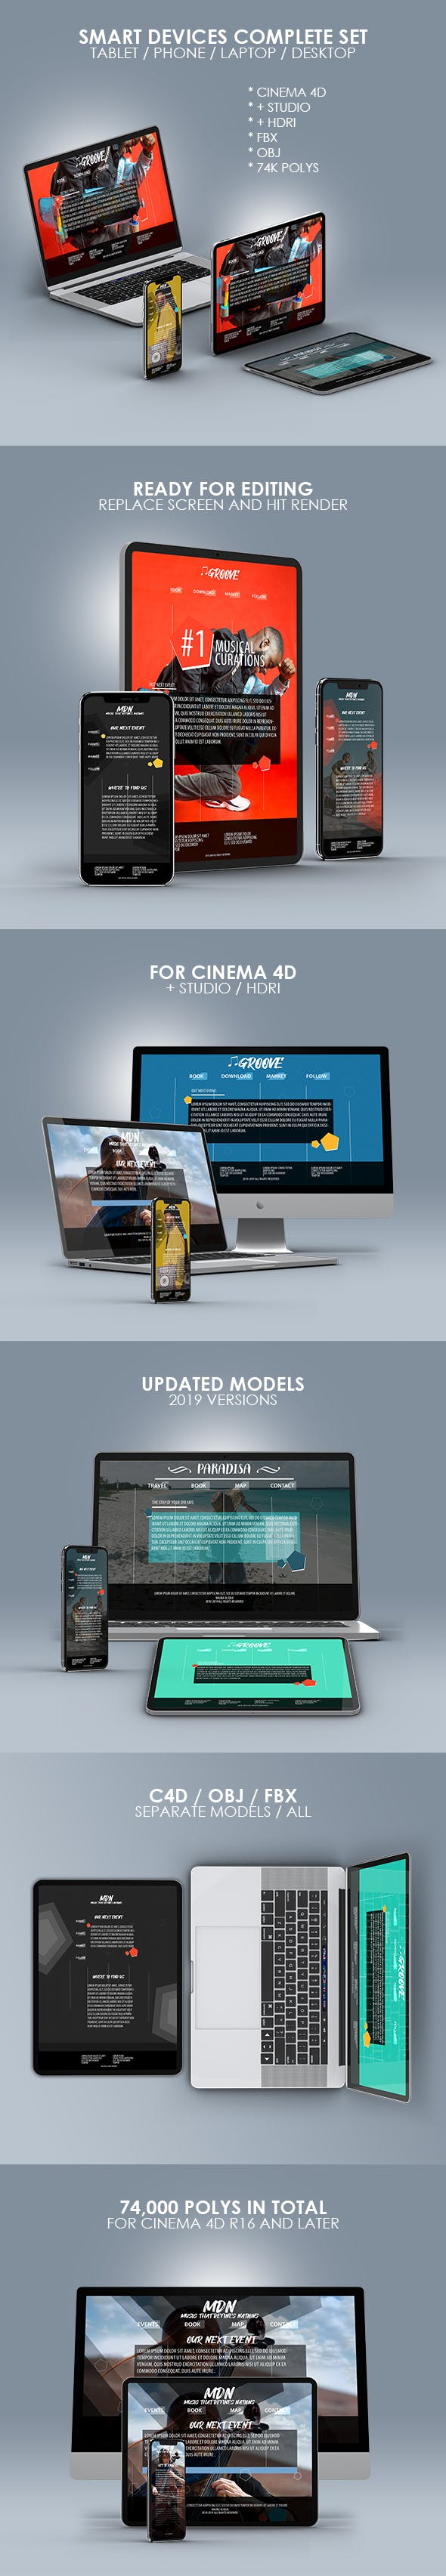 Smart Devices Complete 3D Models Pack - 3DOcean Item for Sale